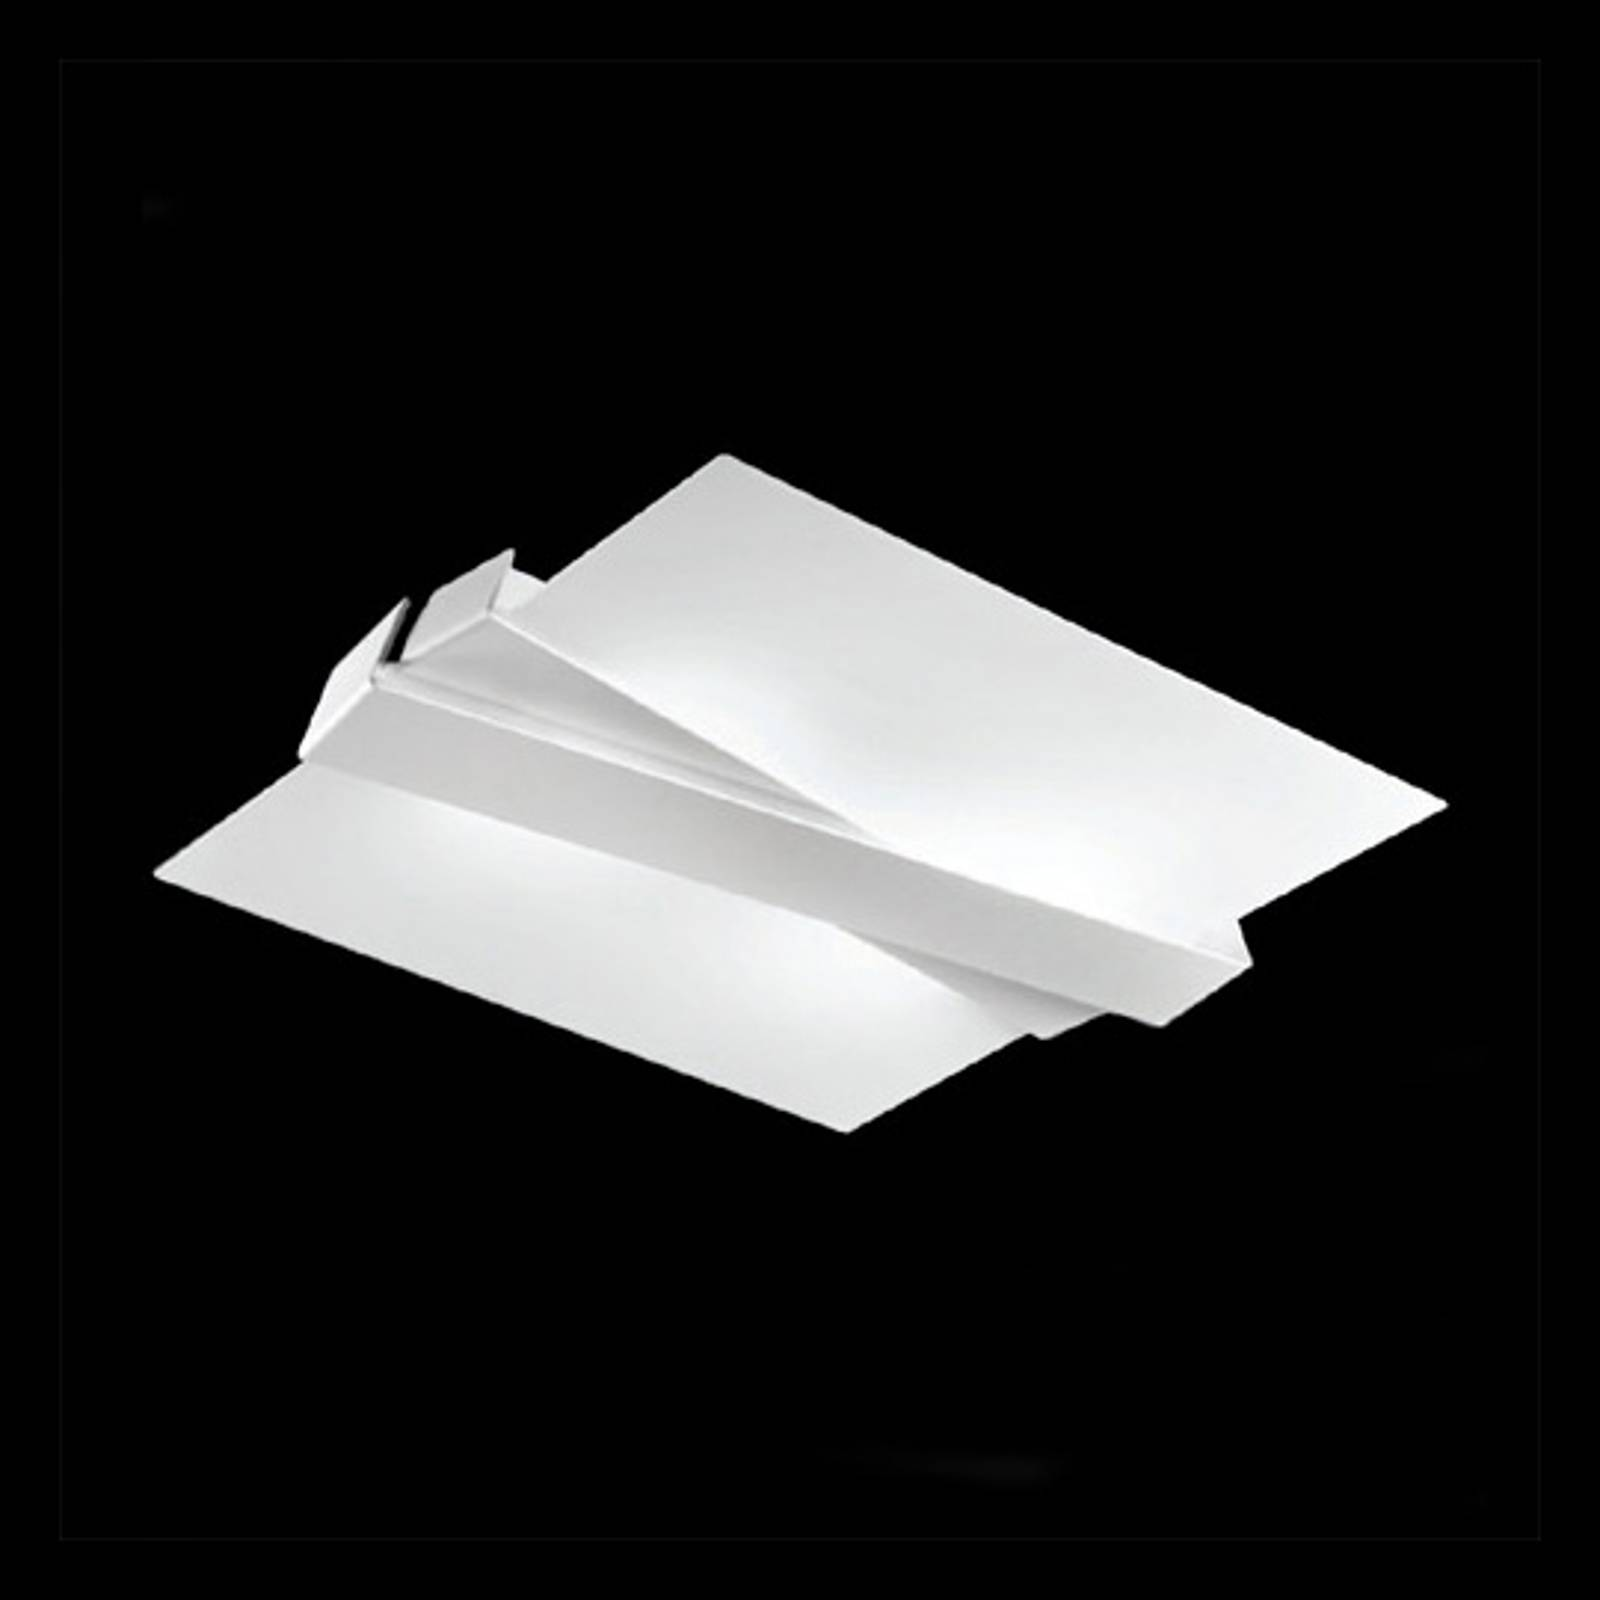 Moderni kattovalaisin ZIG ZAG, valkoinen